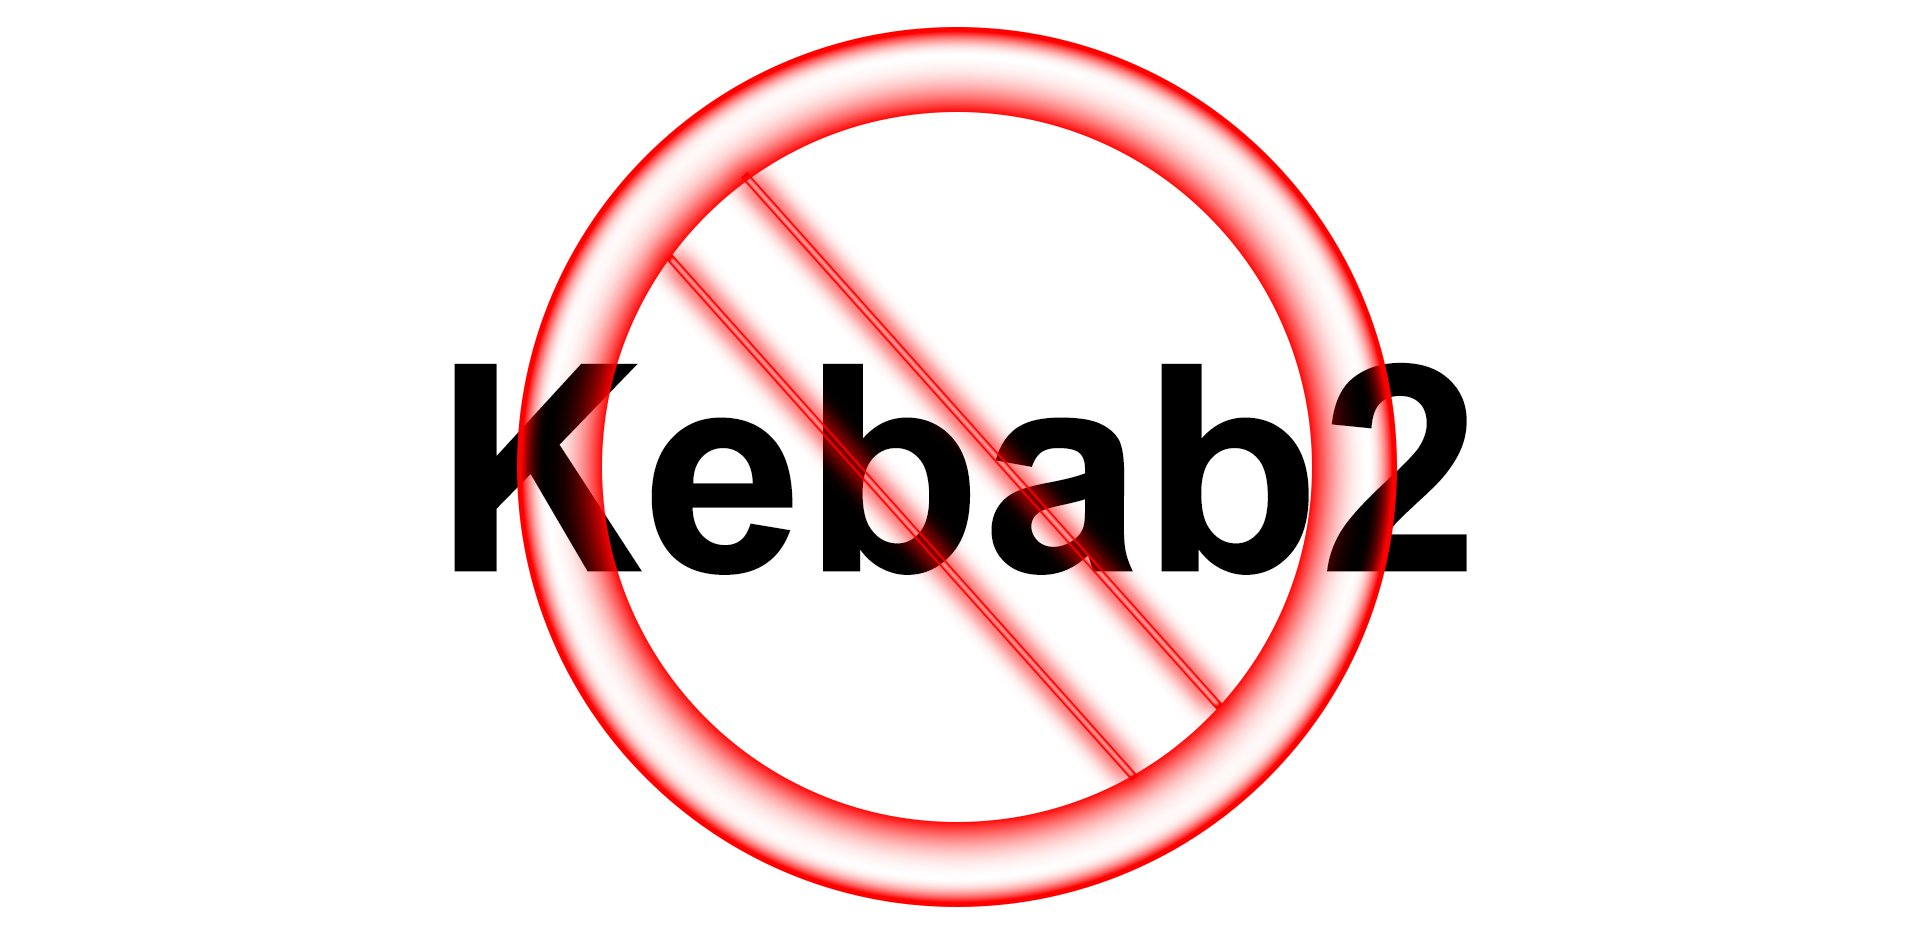 OnePlus 8T Pro kebab2 codename